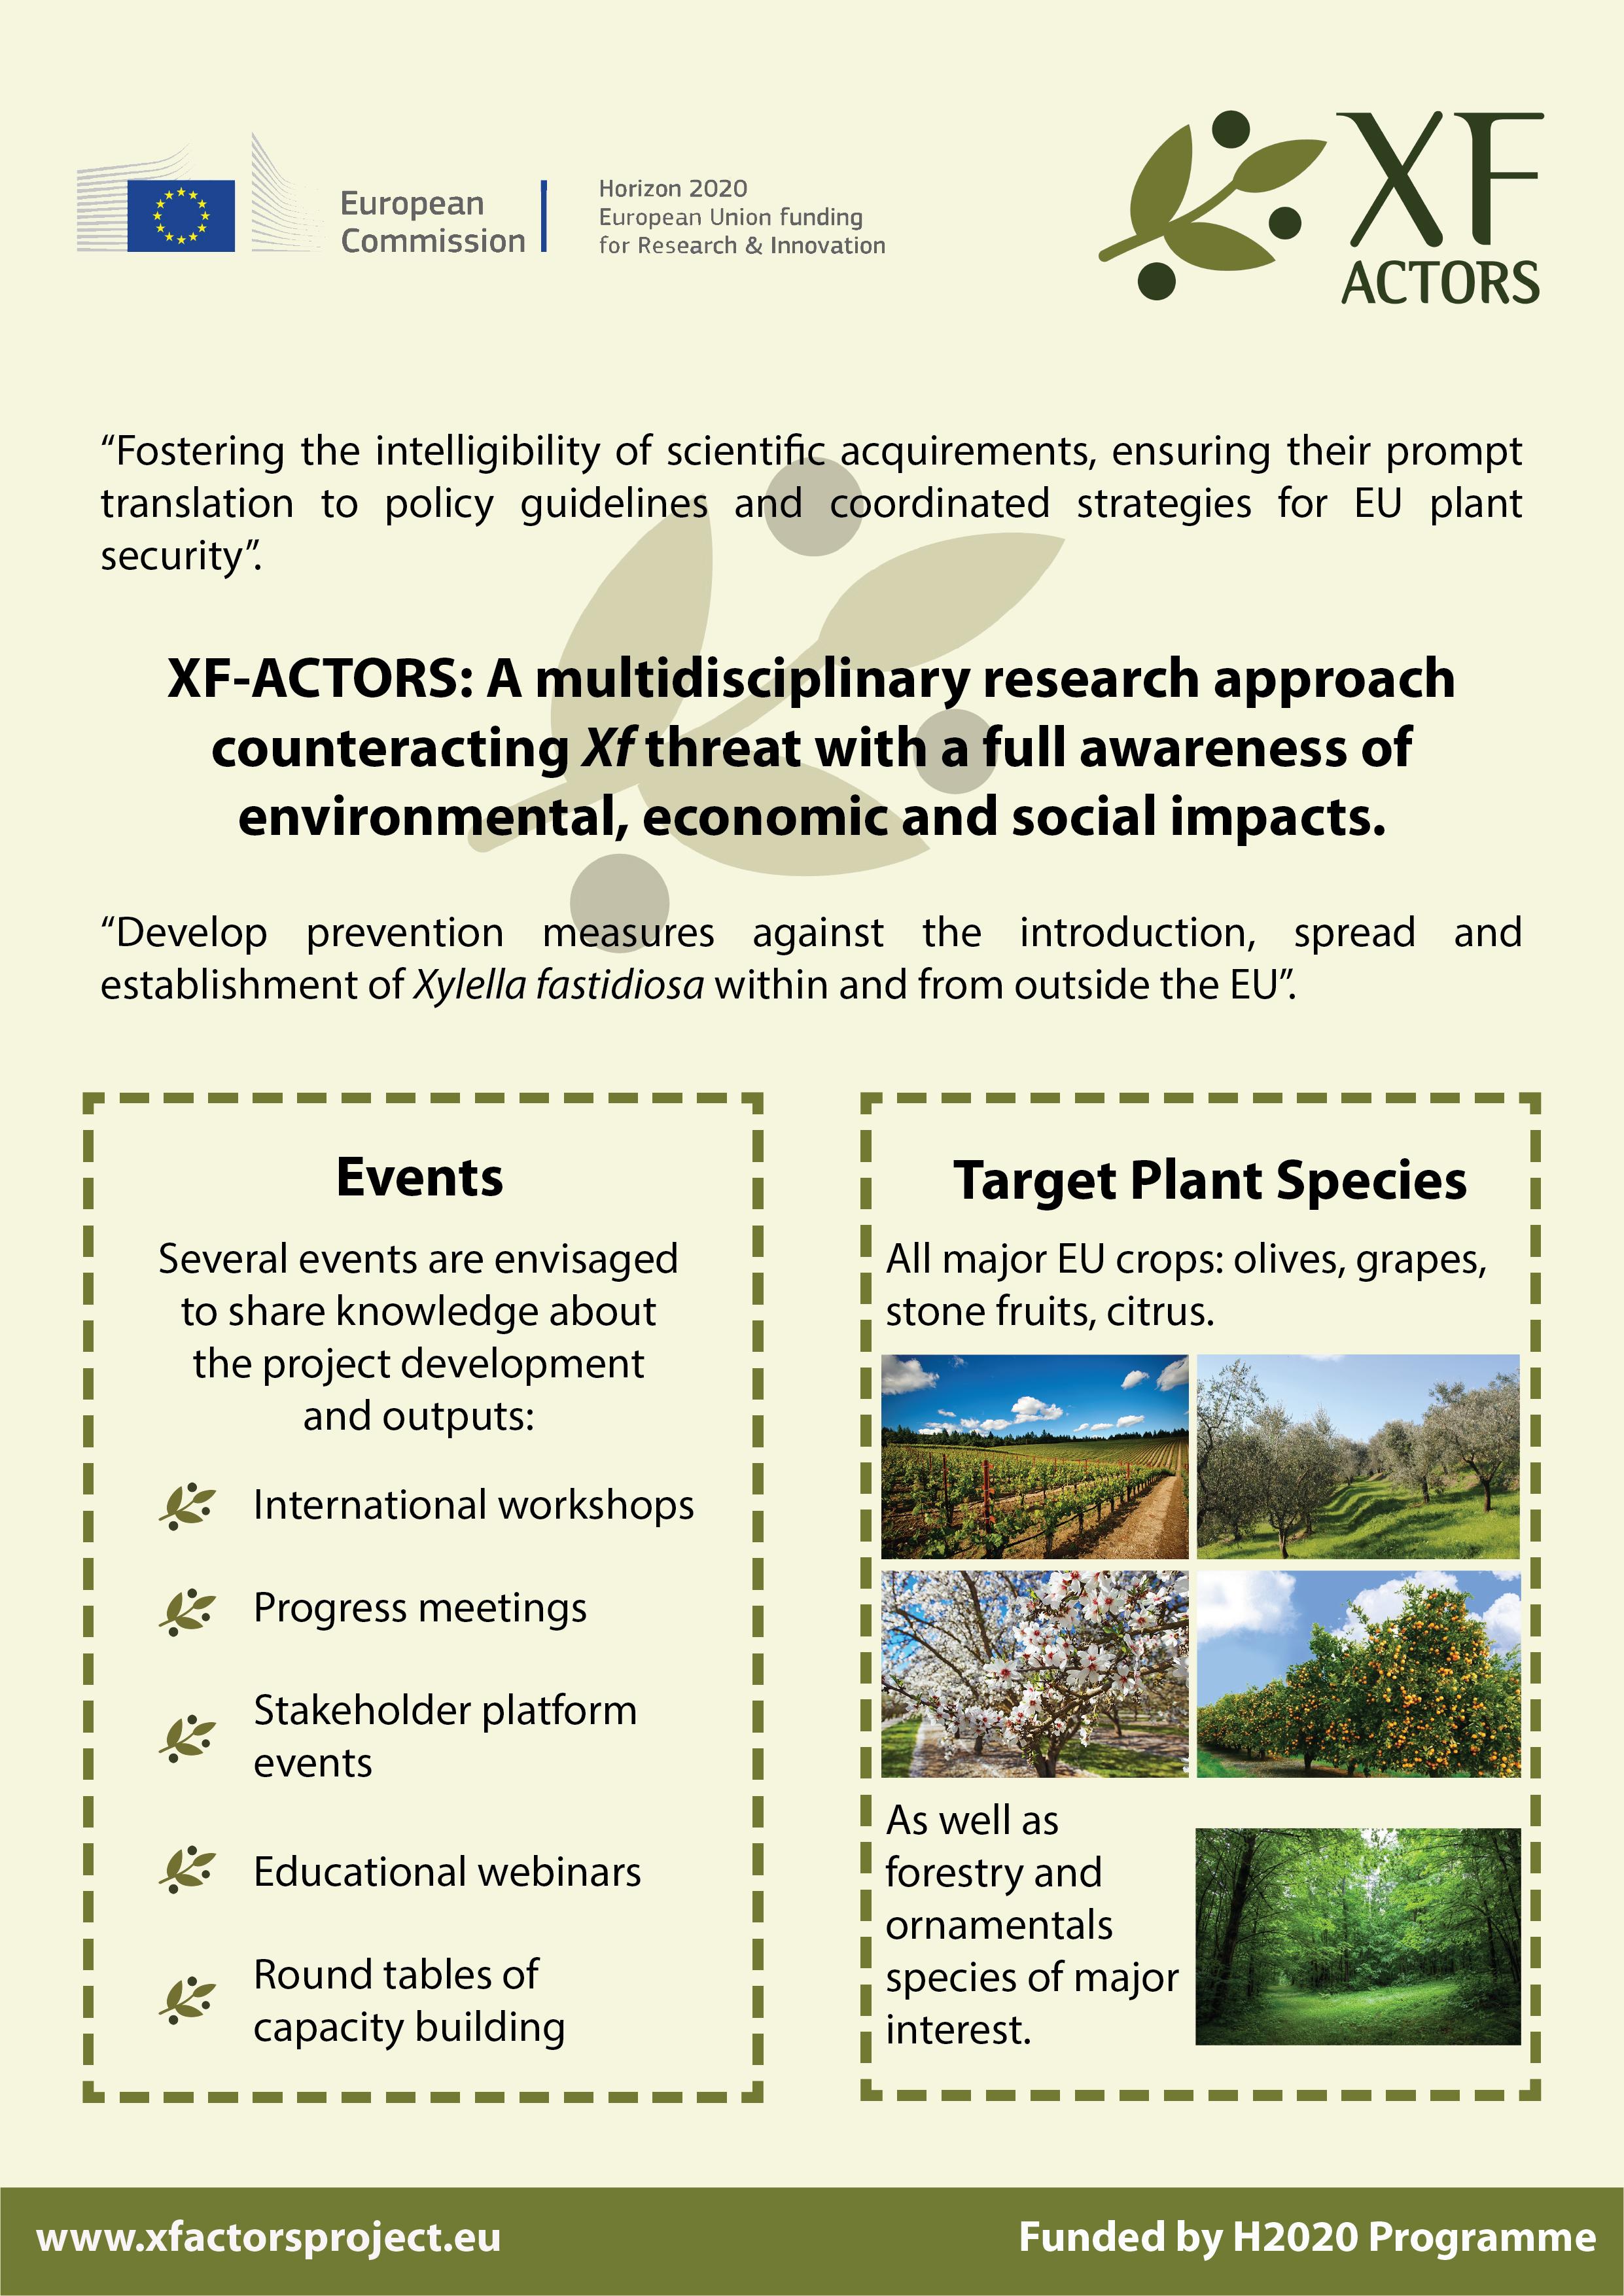 Factsheet 4